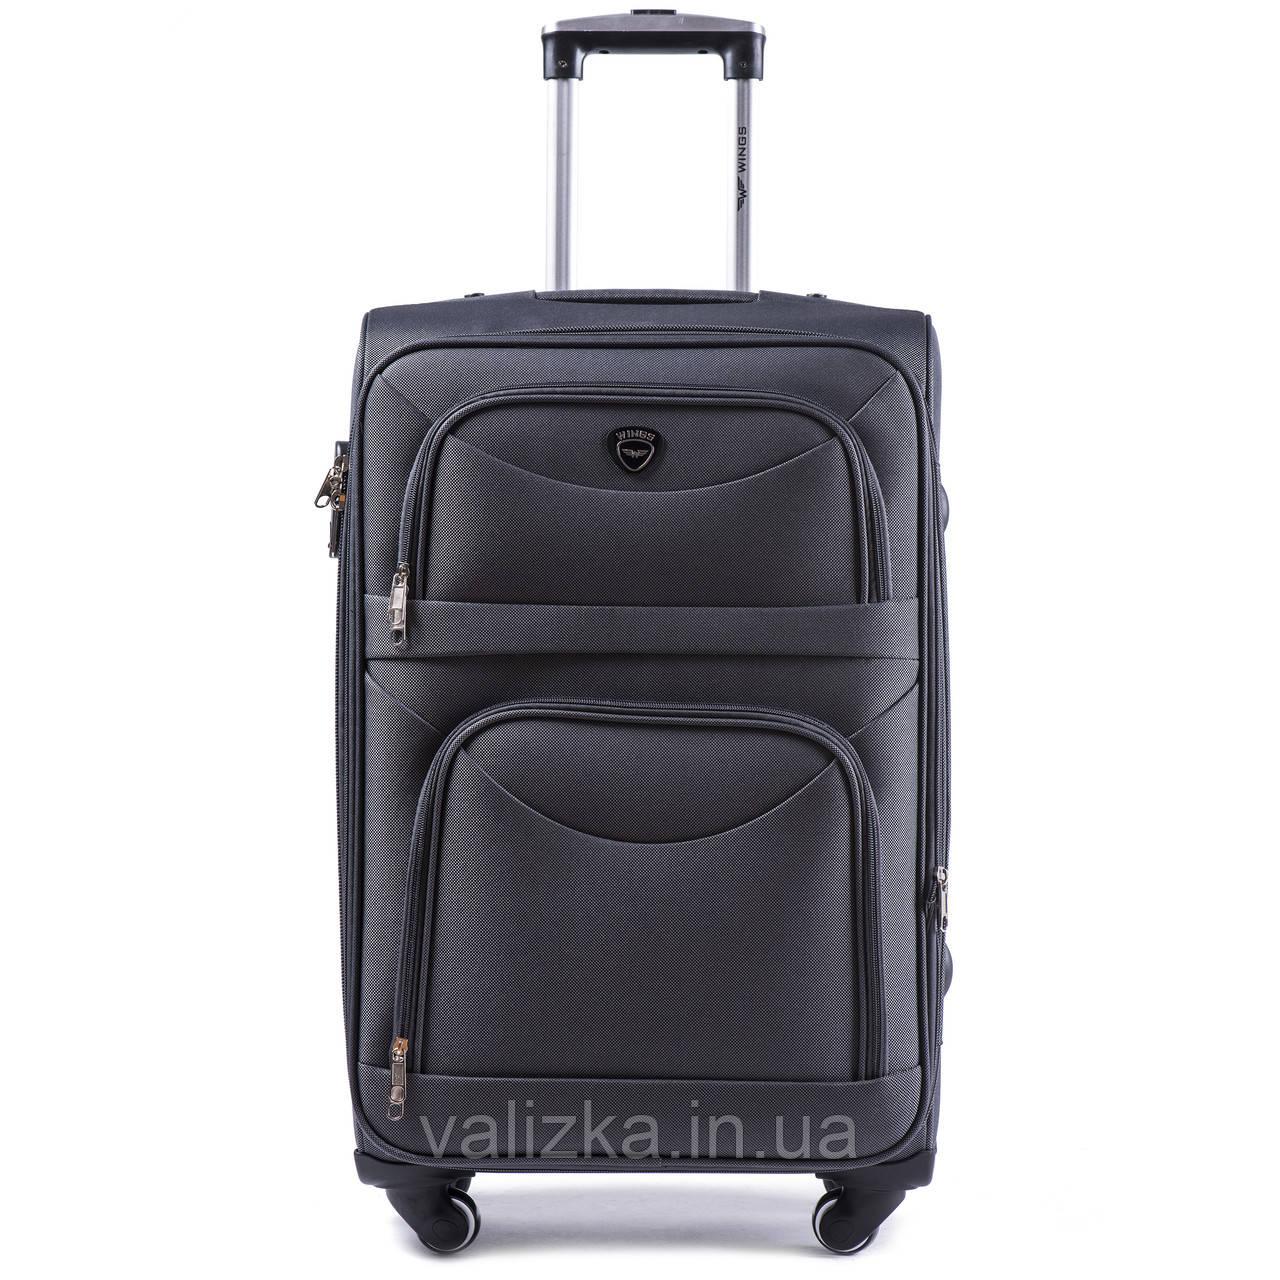 Большой тканевый чемодан серый на 4-х колесах Wings 6802